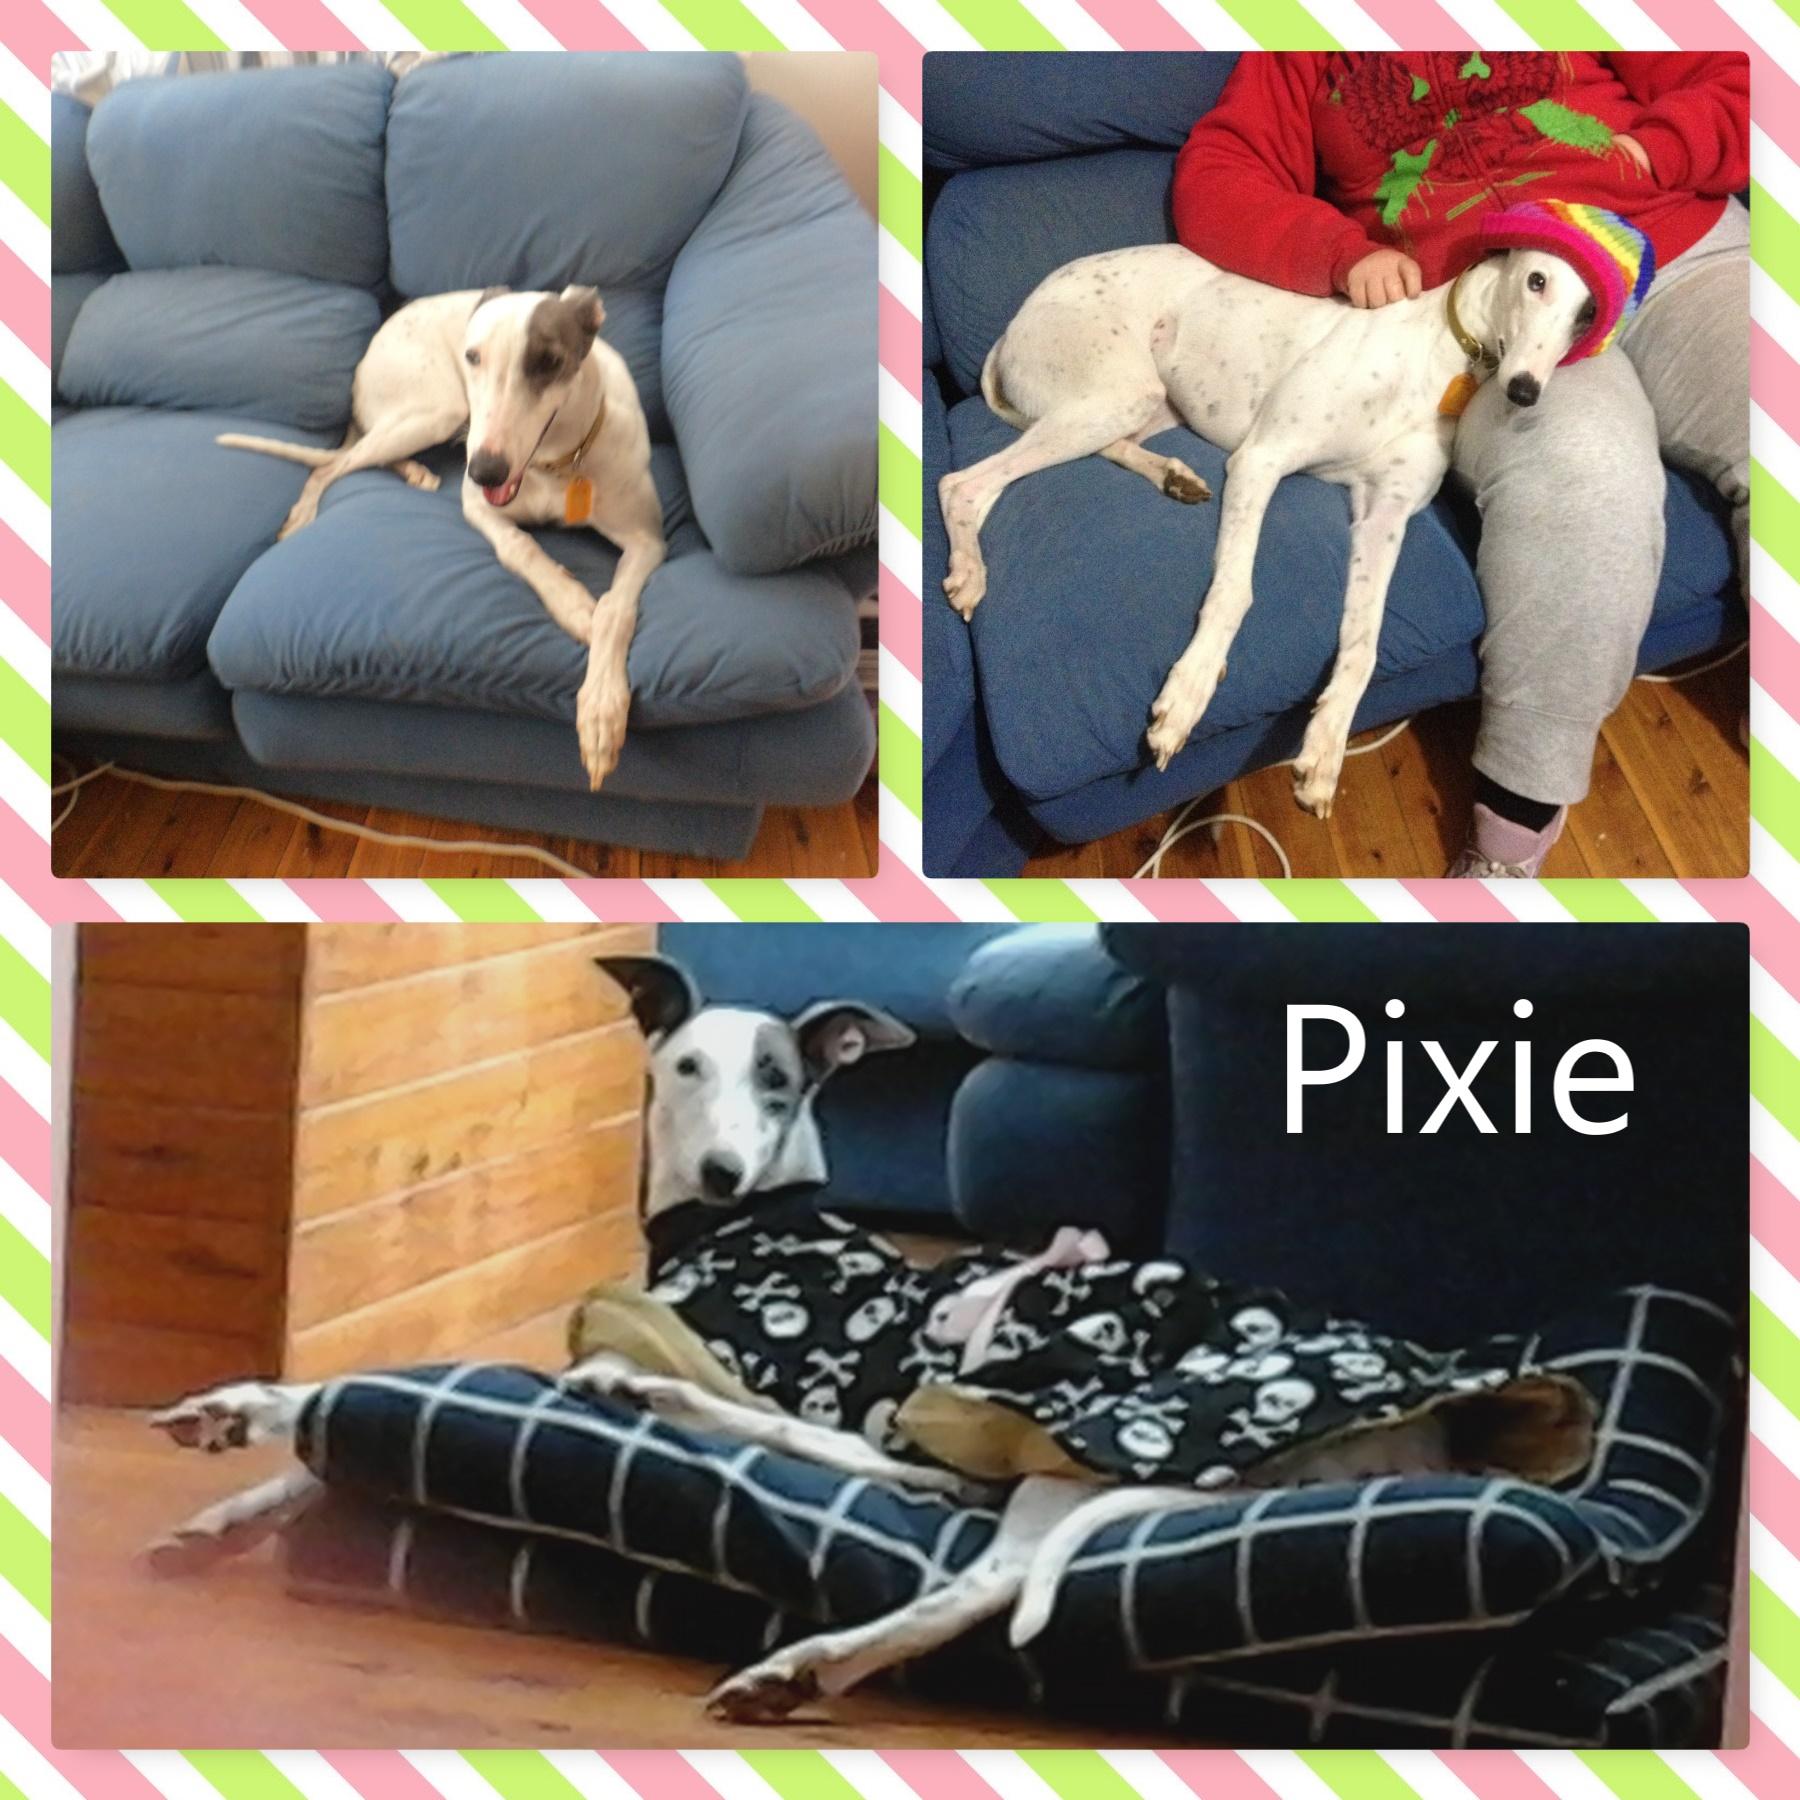 Pixie (Little Patches)